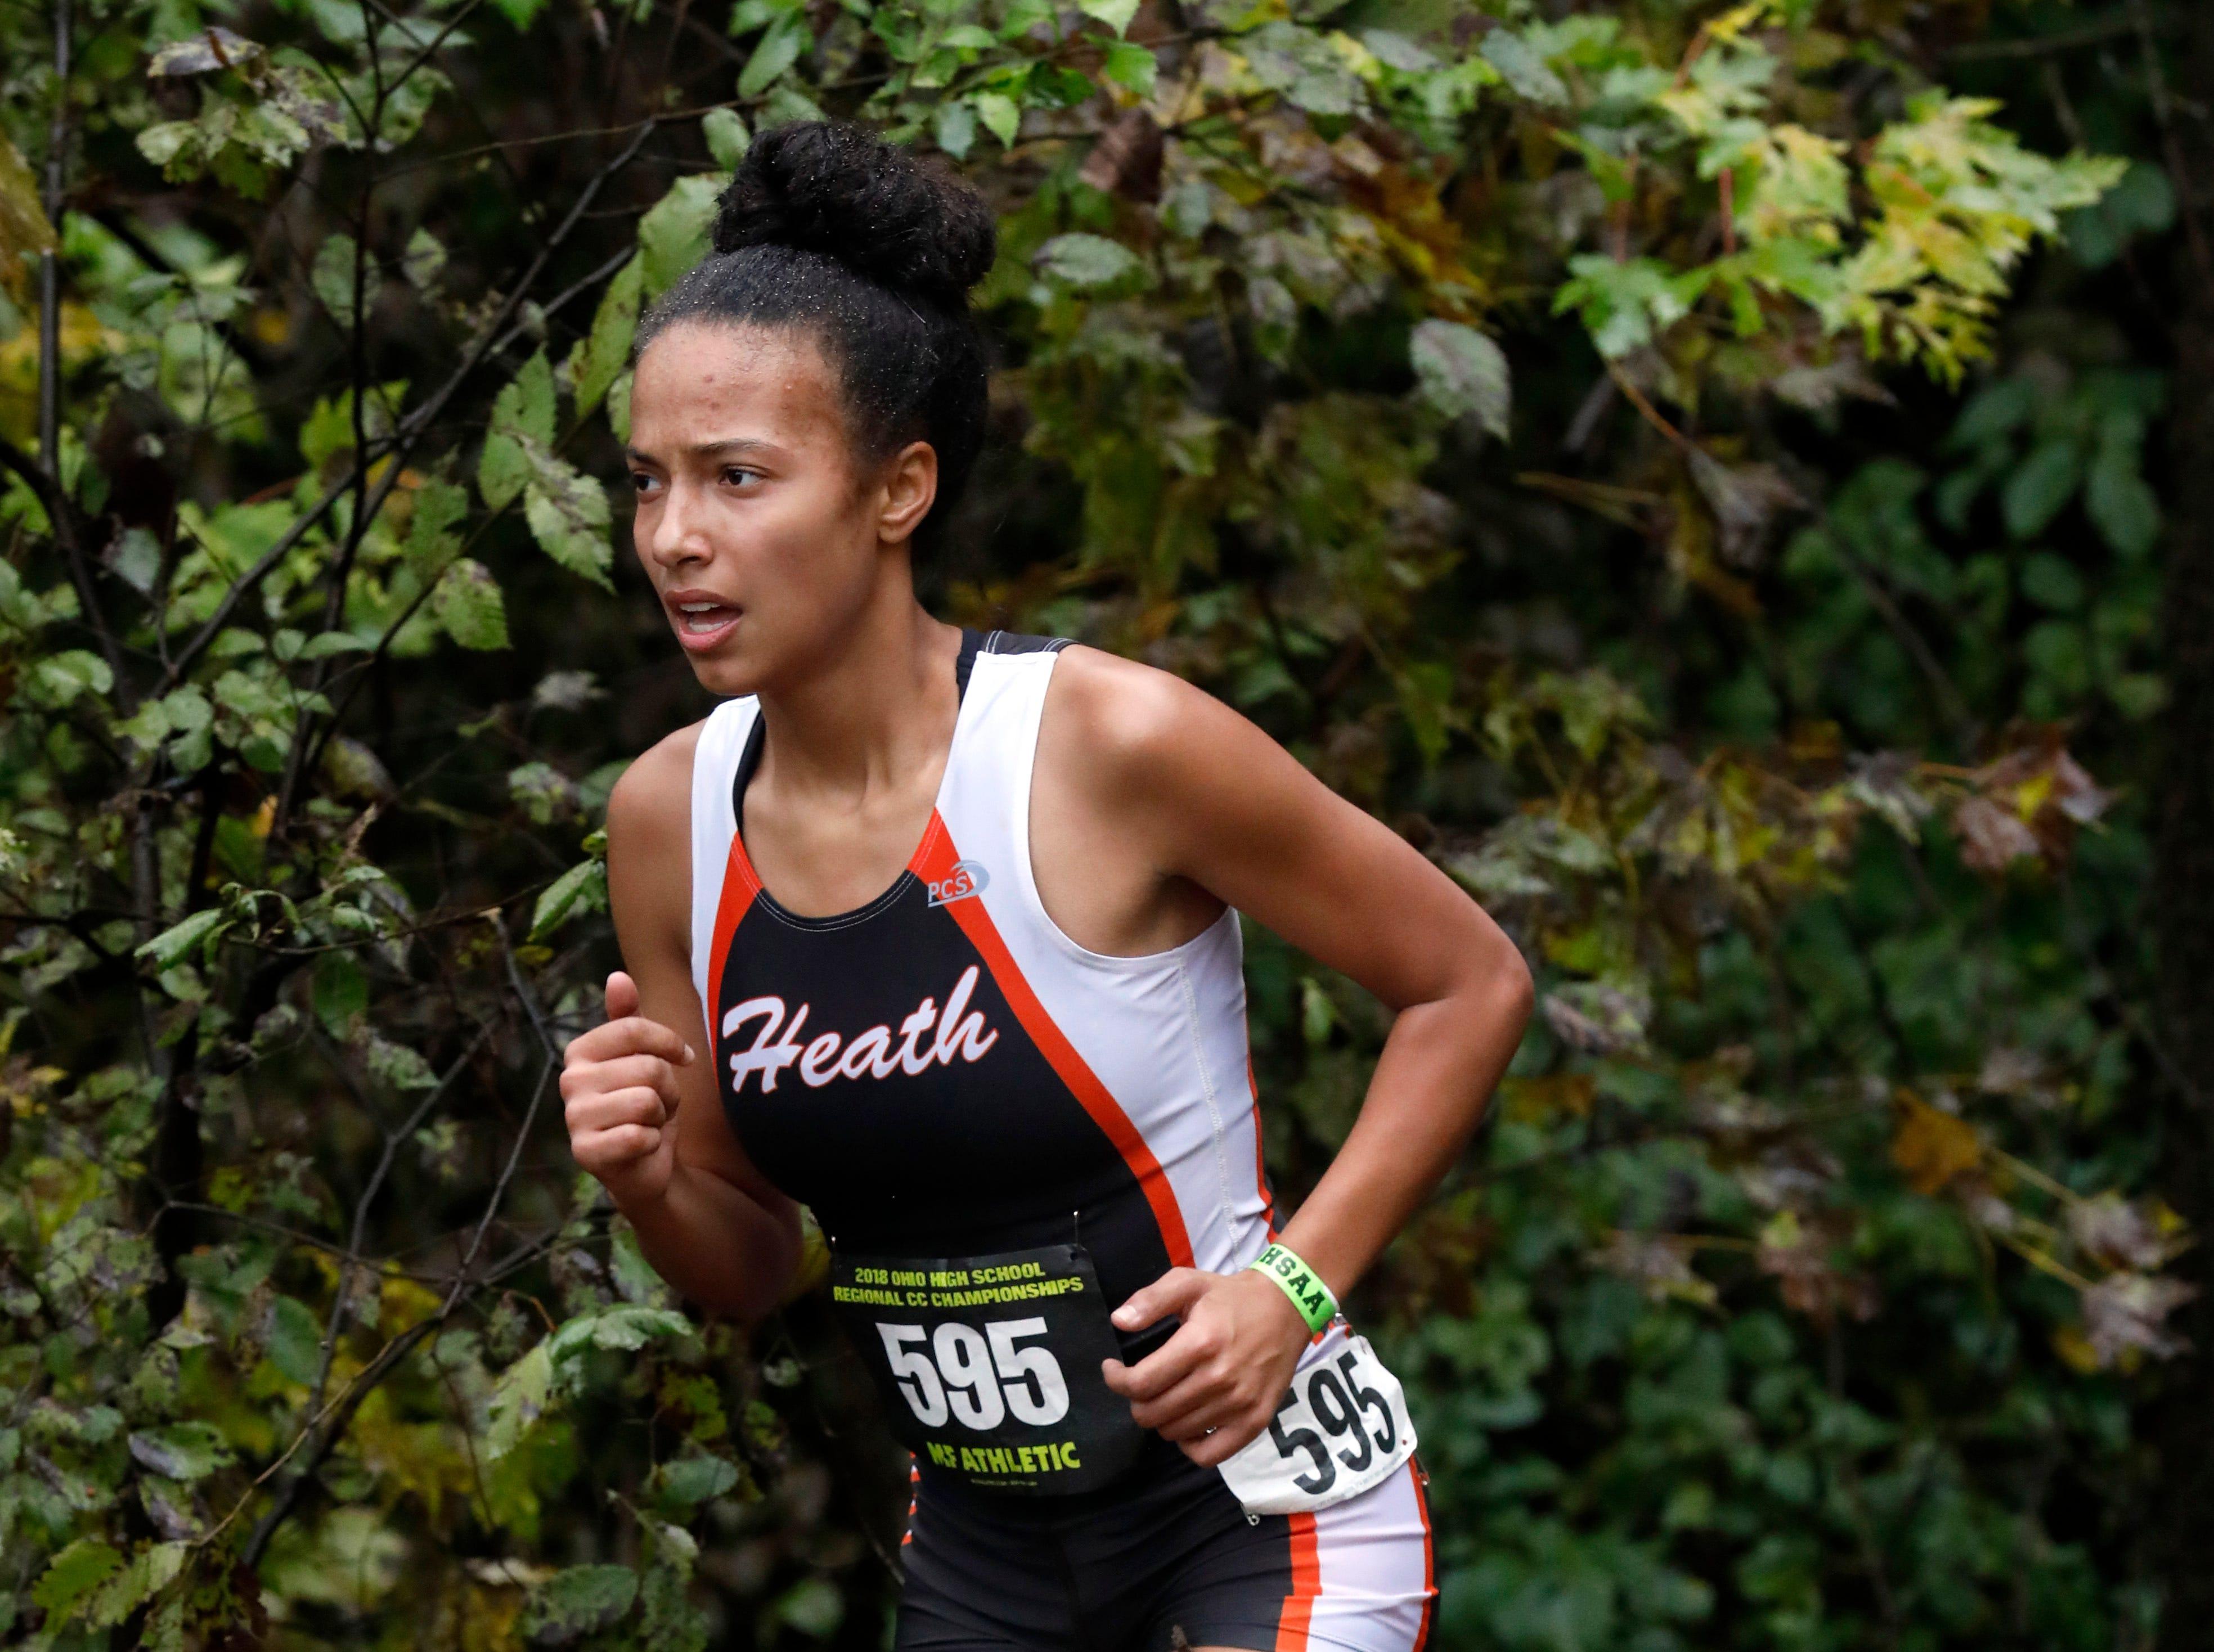 Heath's Arianna Spivey runs in the Regional Cross Country meet Saturday, Oct. 27, 2018, at Pickerington North High School in Pickerington.